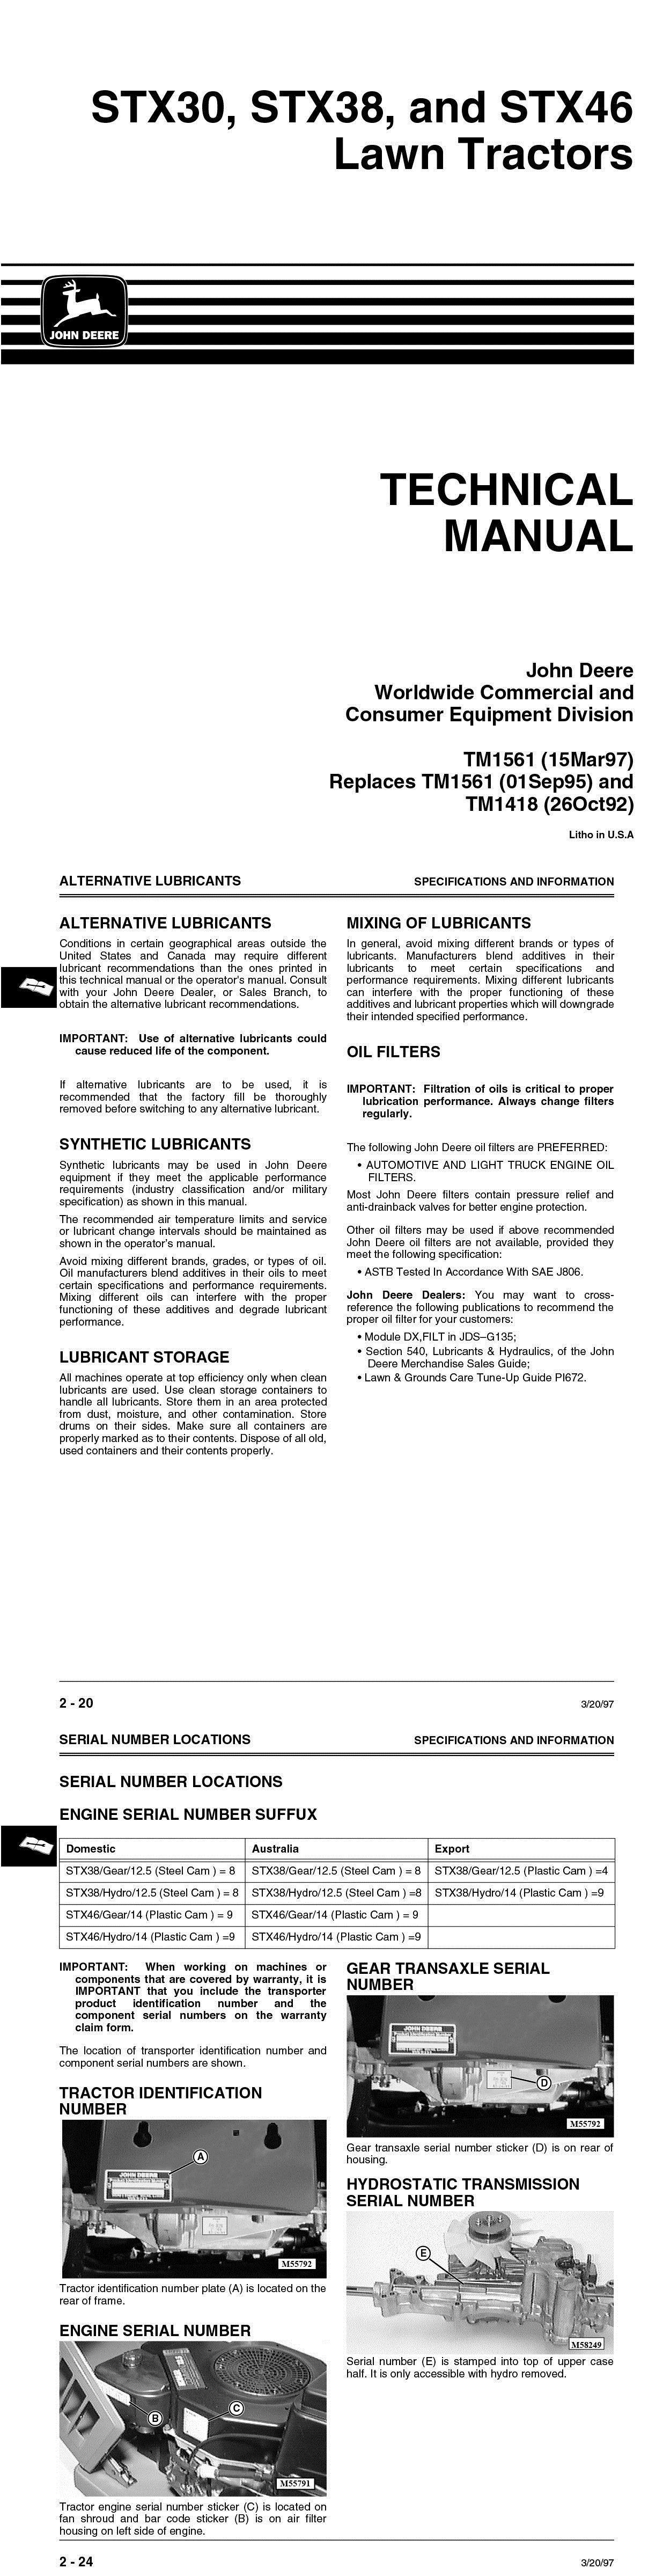 manuals and guides 42229 john deere stx30 stx38 stx46 lawn tractors rh pinterest com john deere stx30 owners manual John Deere STX30 Gas Tank